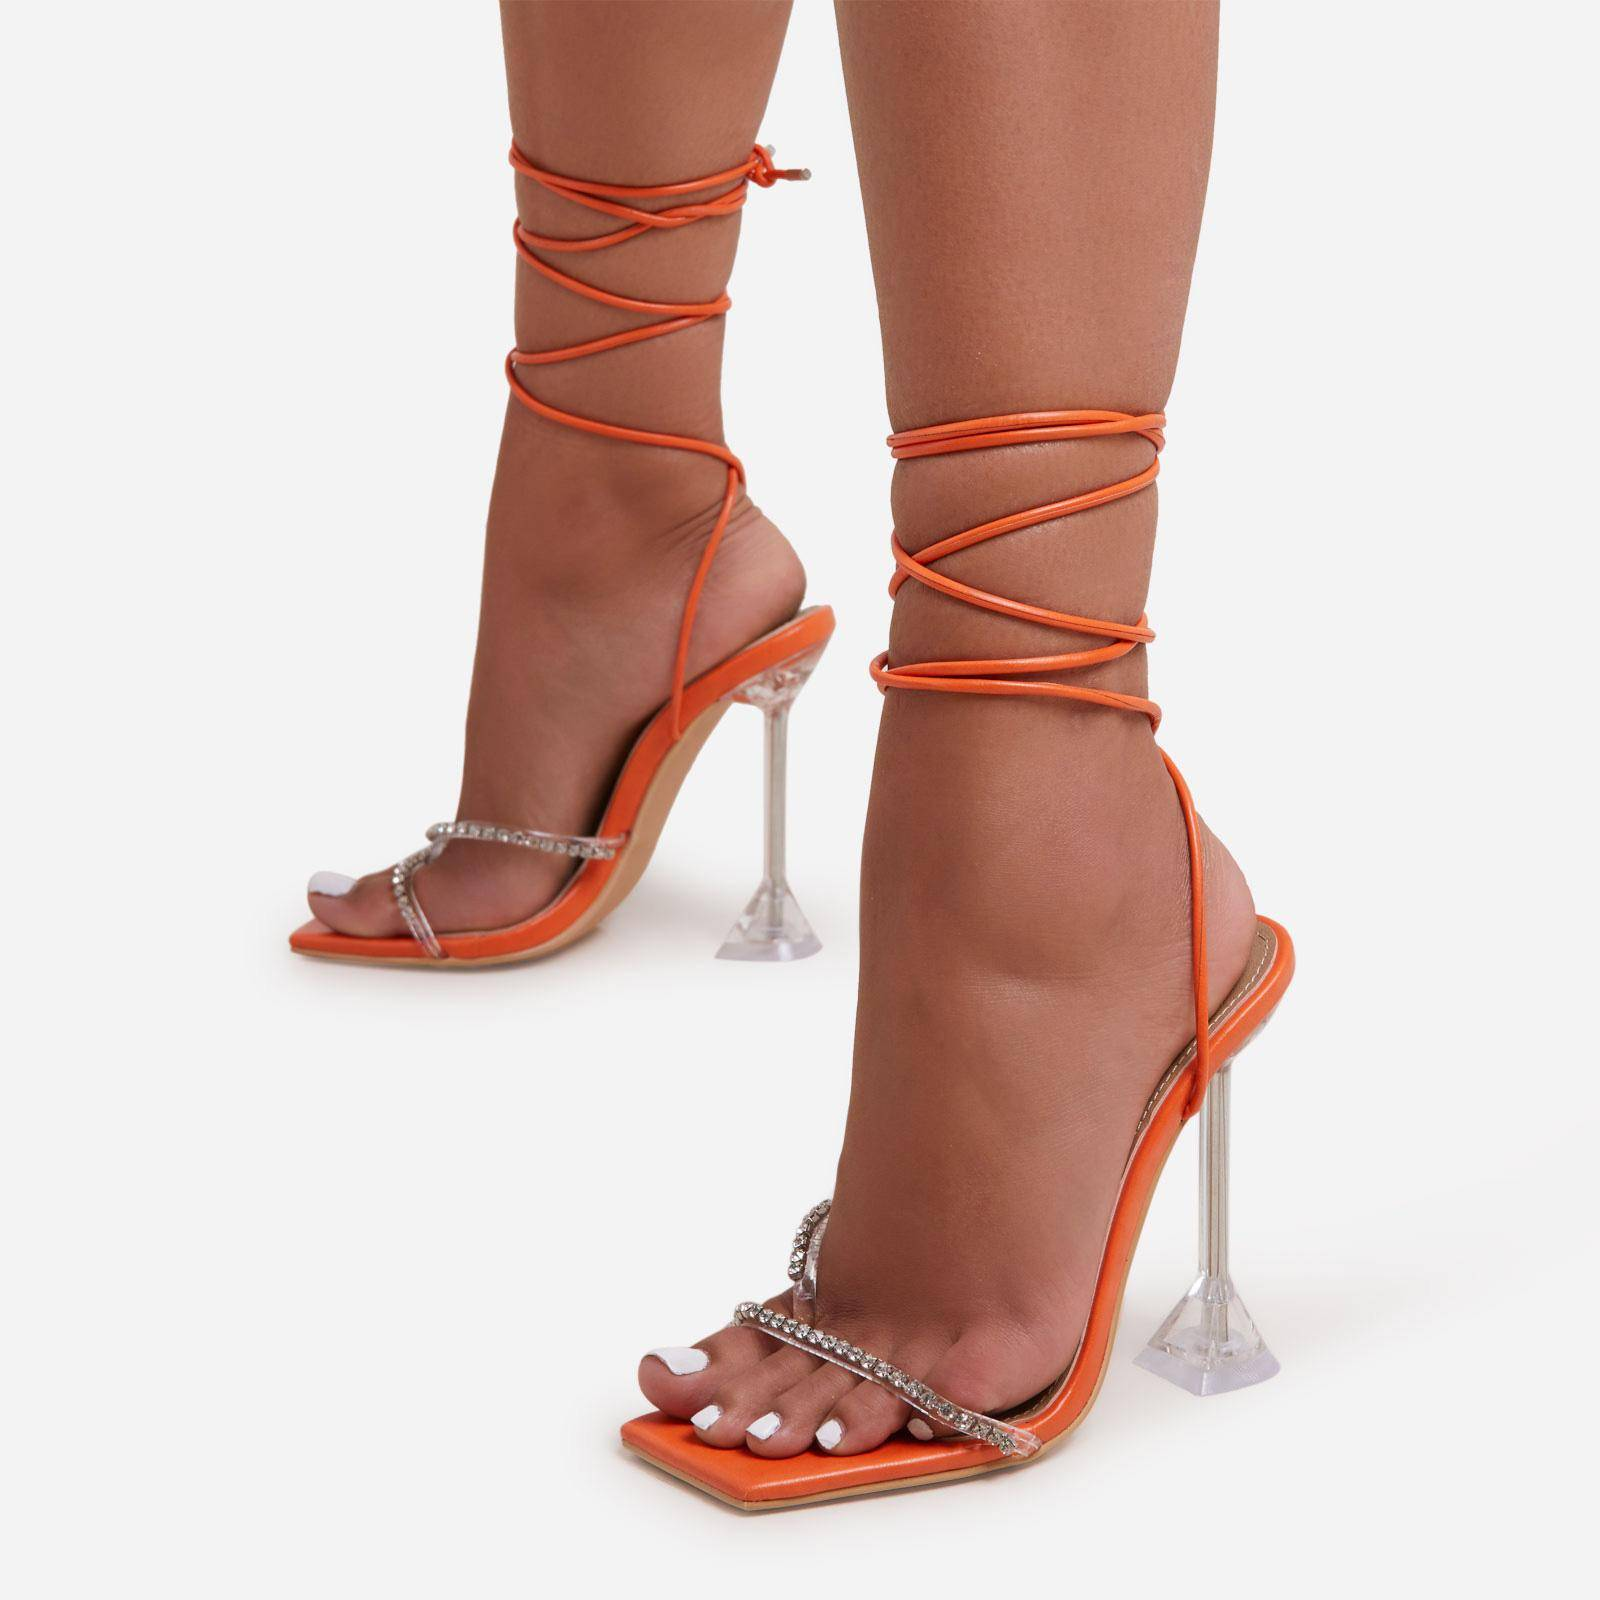 EGO Romantic Diamante Detail Lace Up Square Toe Clear Perspex Sculptured Heel In Orange Faux Leather, Orange  - female - Size: 7